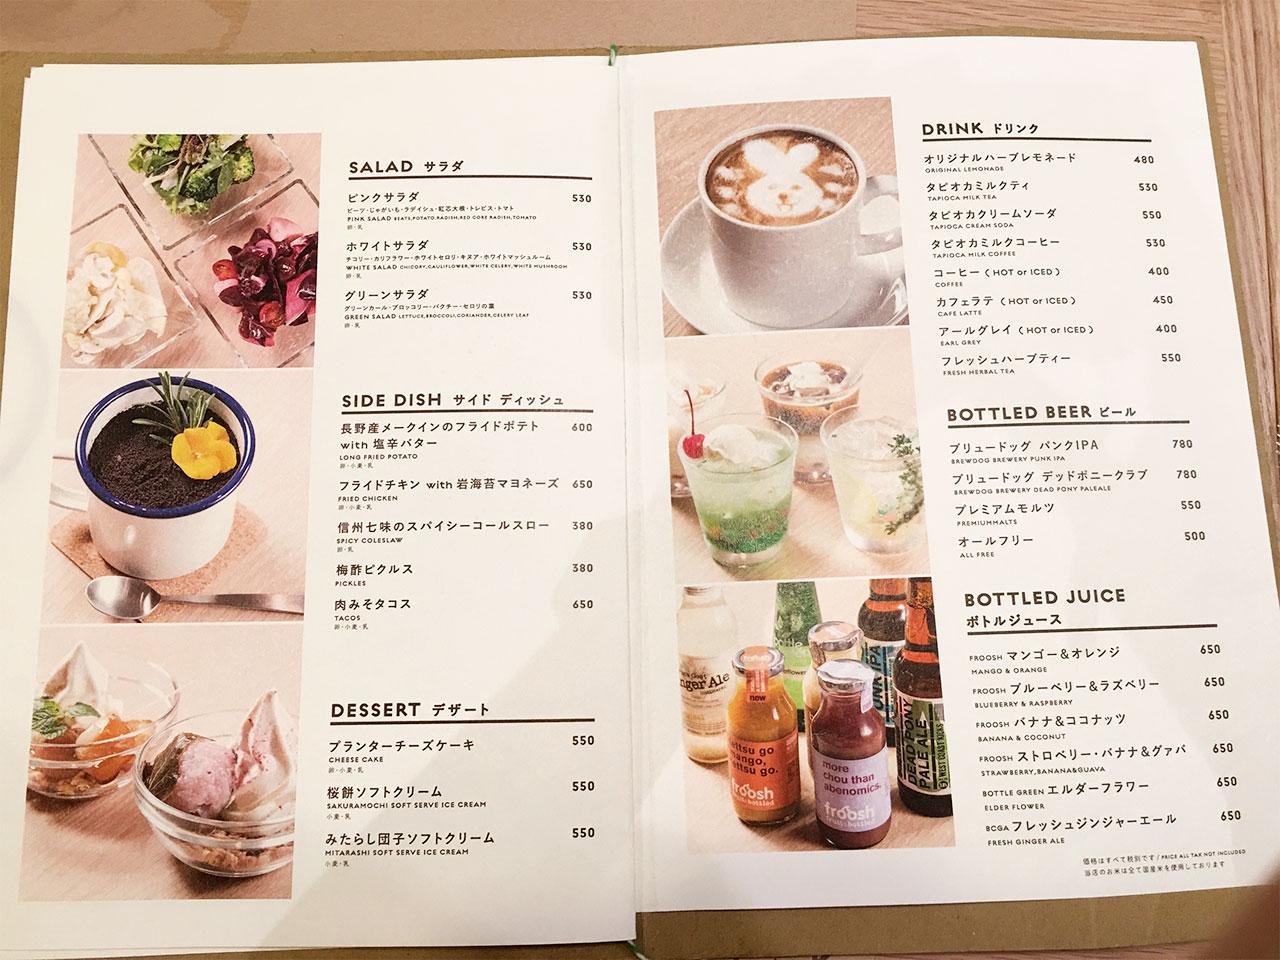 tachikawa-danboard-cafe-menu04